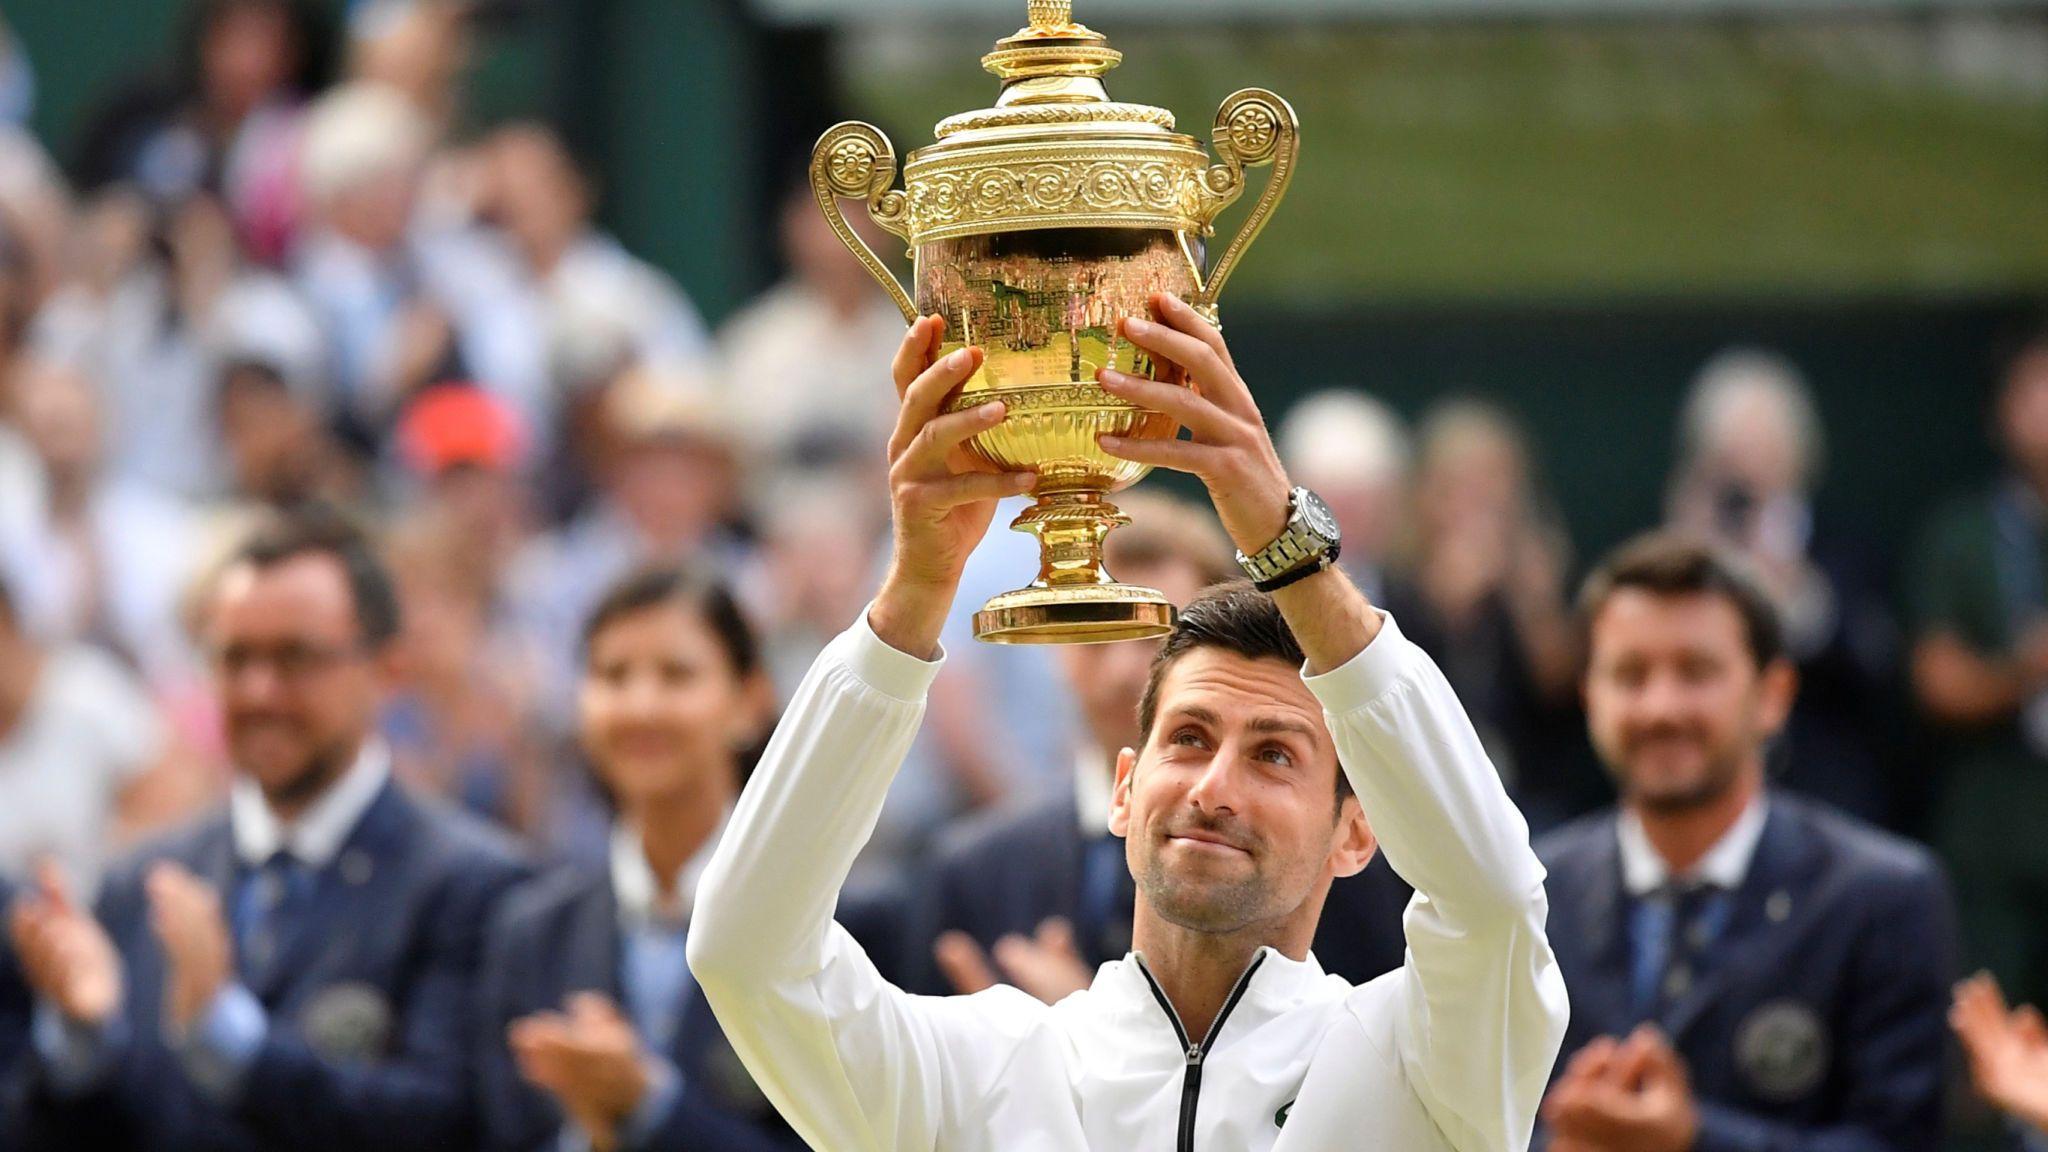 Novak Djokovic Wears Seiko Astron At Wimbledon 2019